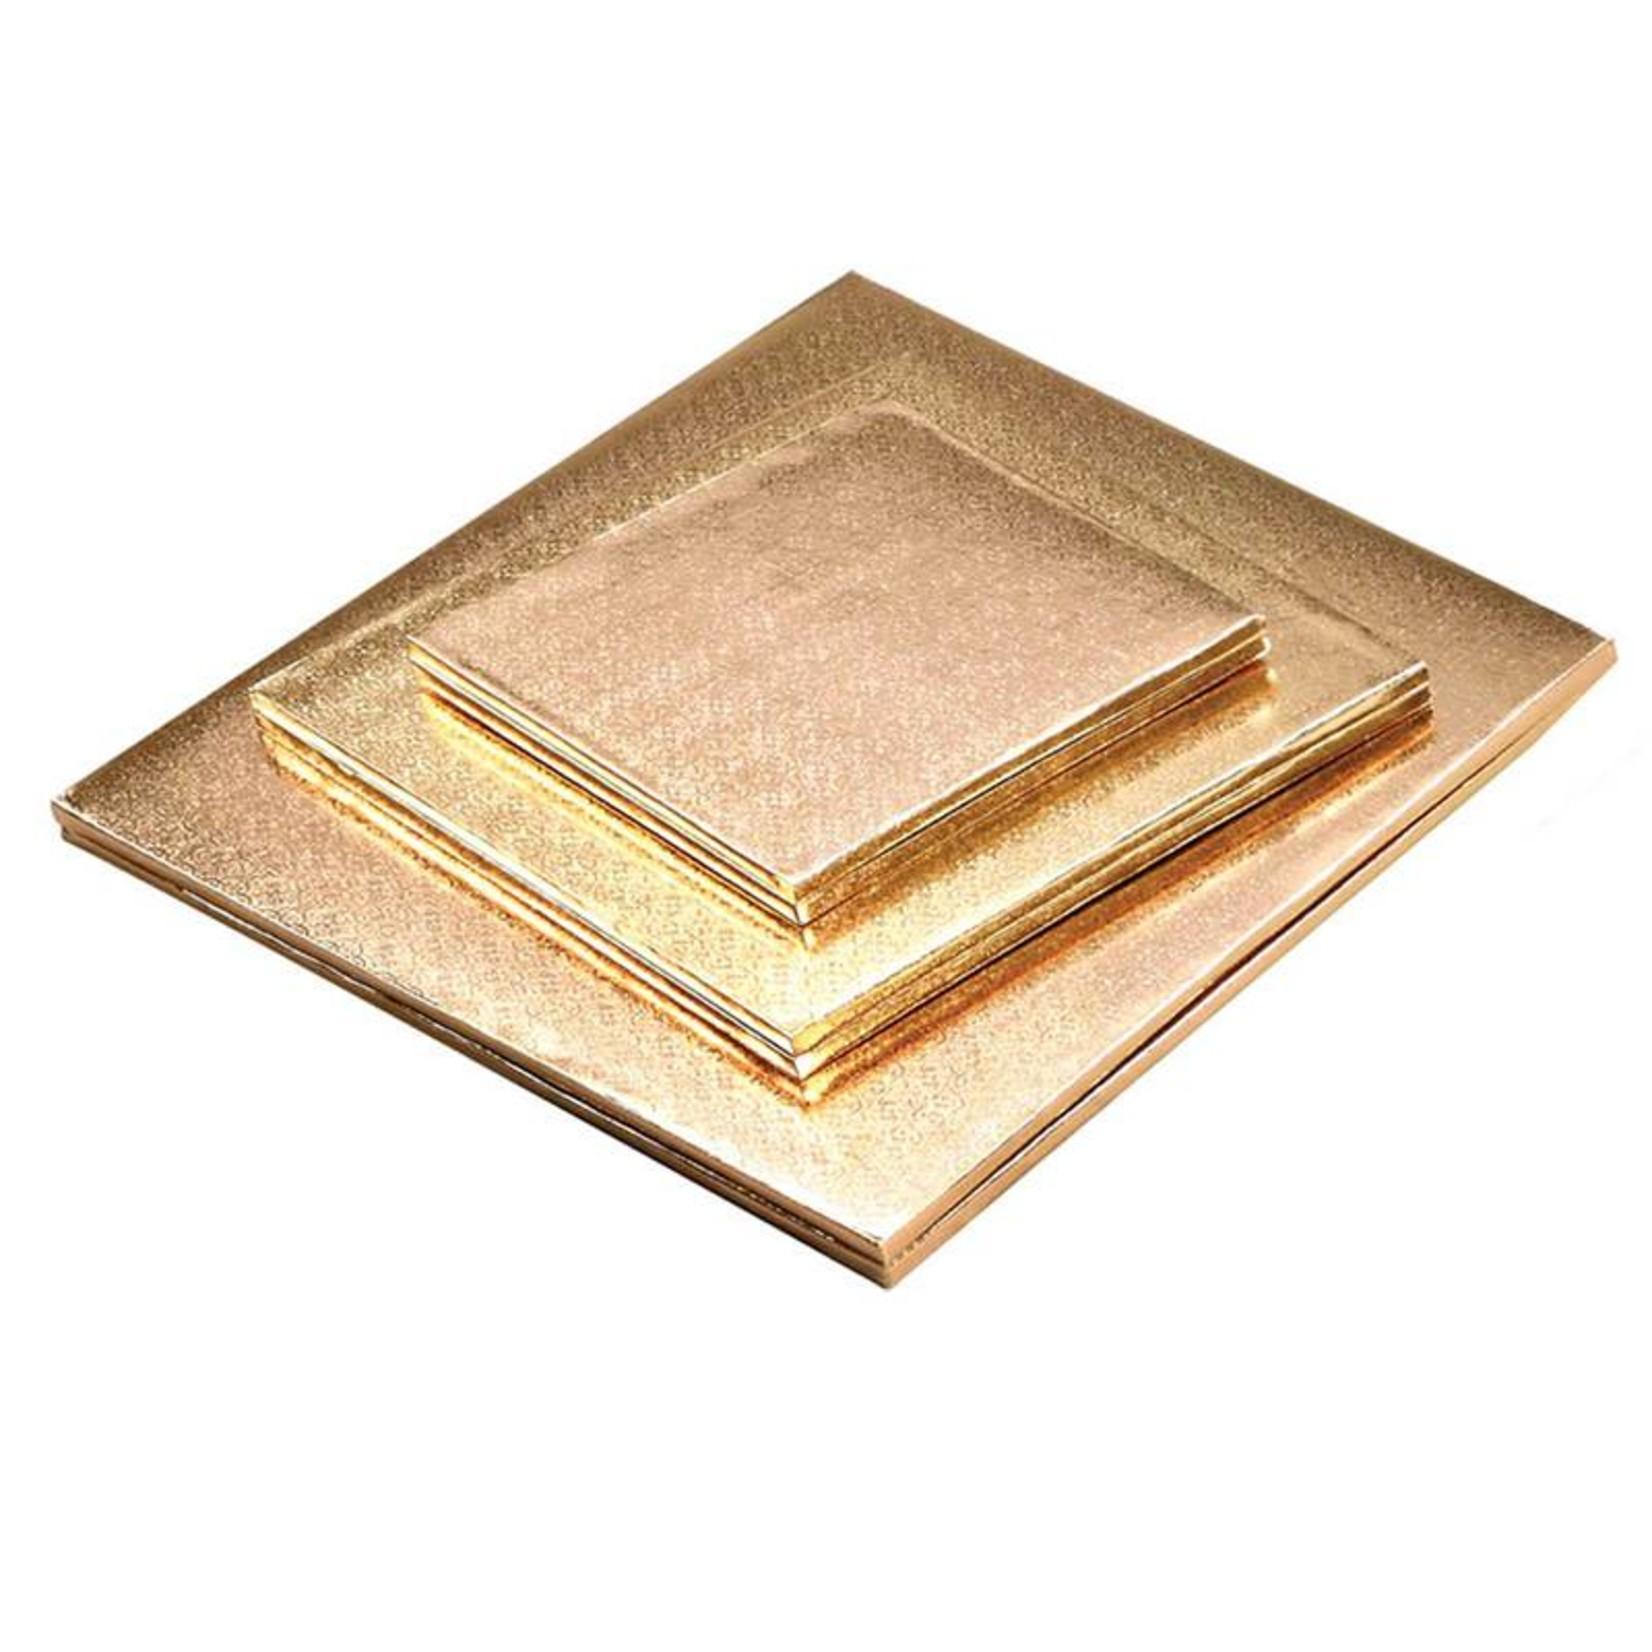 "Enjay Enjay - Cake drum - 1/2"" square, Gold -"